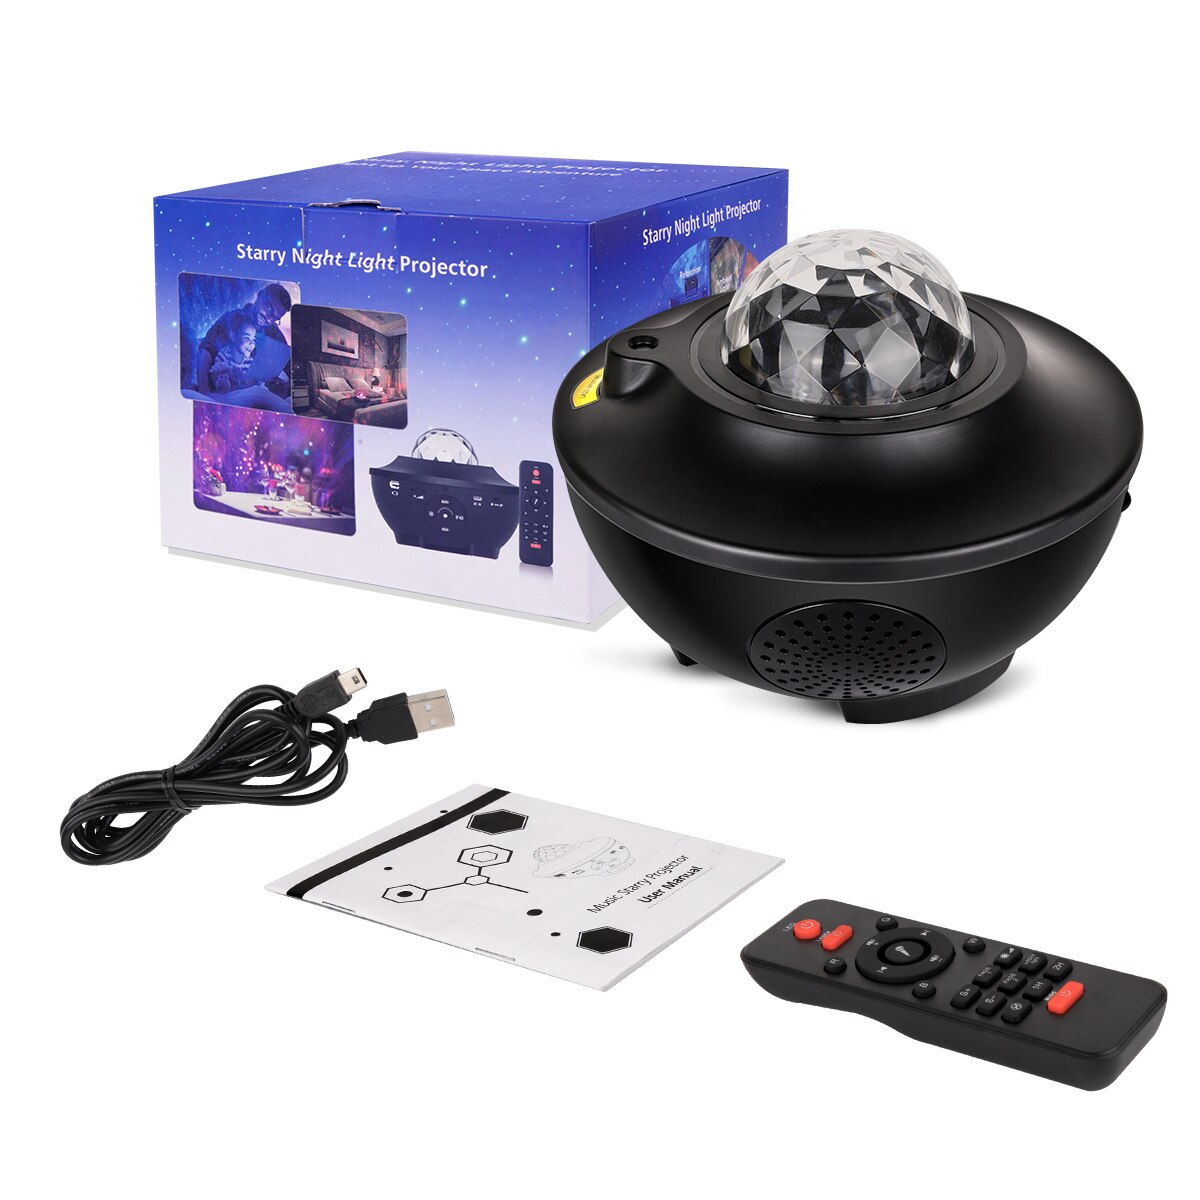 Starry Sky Galaxy Projector Wifi Blueteeth USB Music Speaker Star Night Light Romantic Alexa Phone Home Smart Projection Lamp enlarge